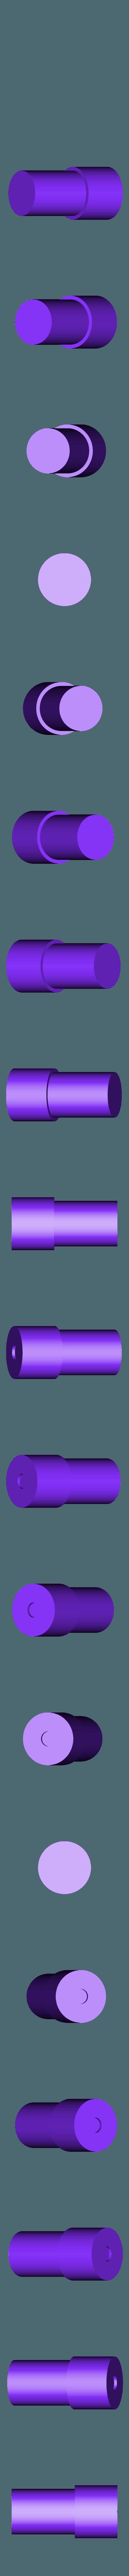 Moteur sans support (1).stl Download STL file Removable portable wind turbine • 3D printable template, younessanga